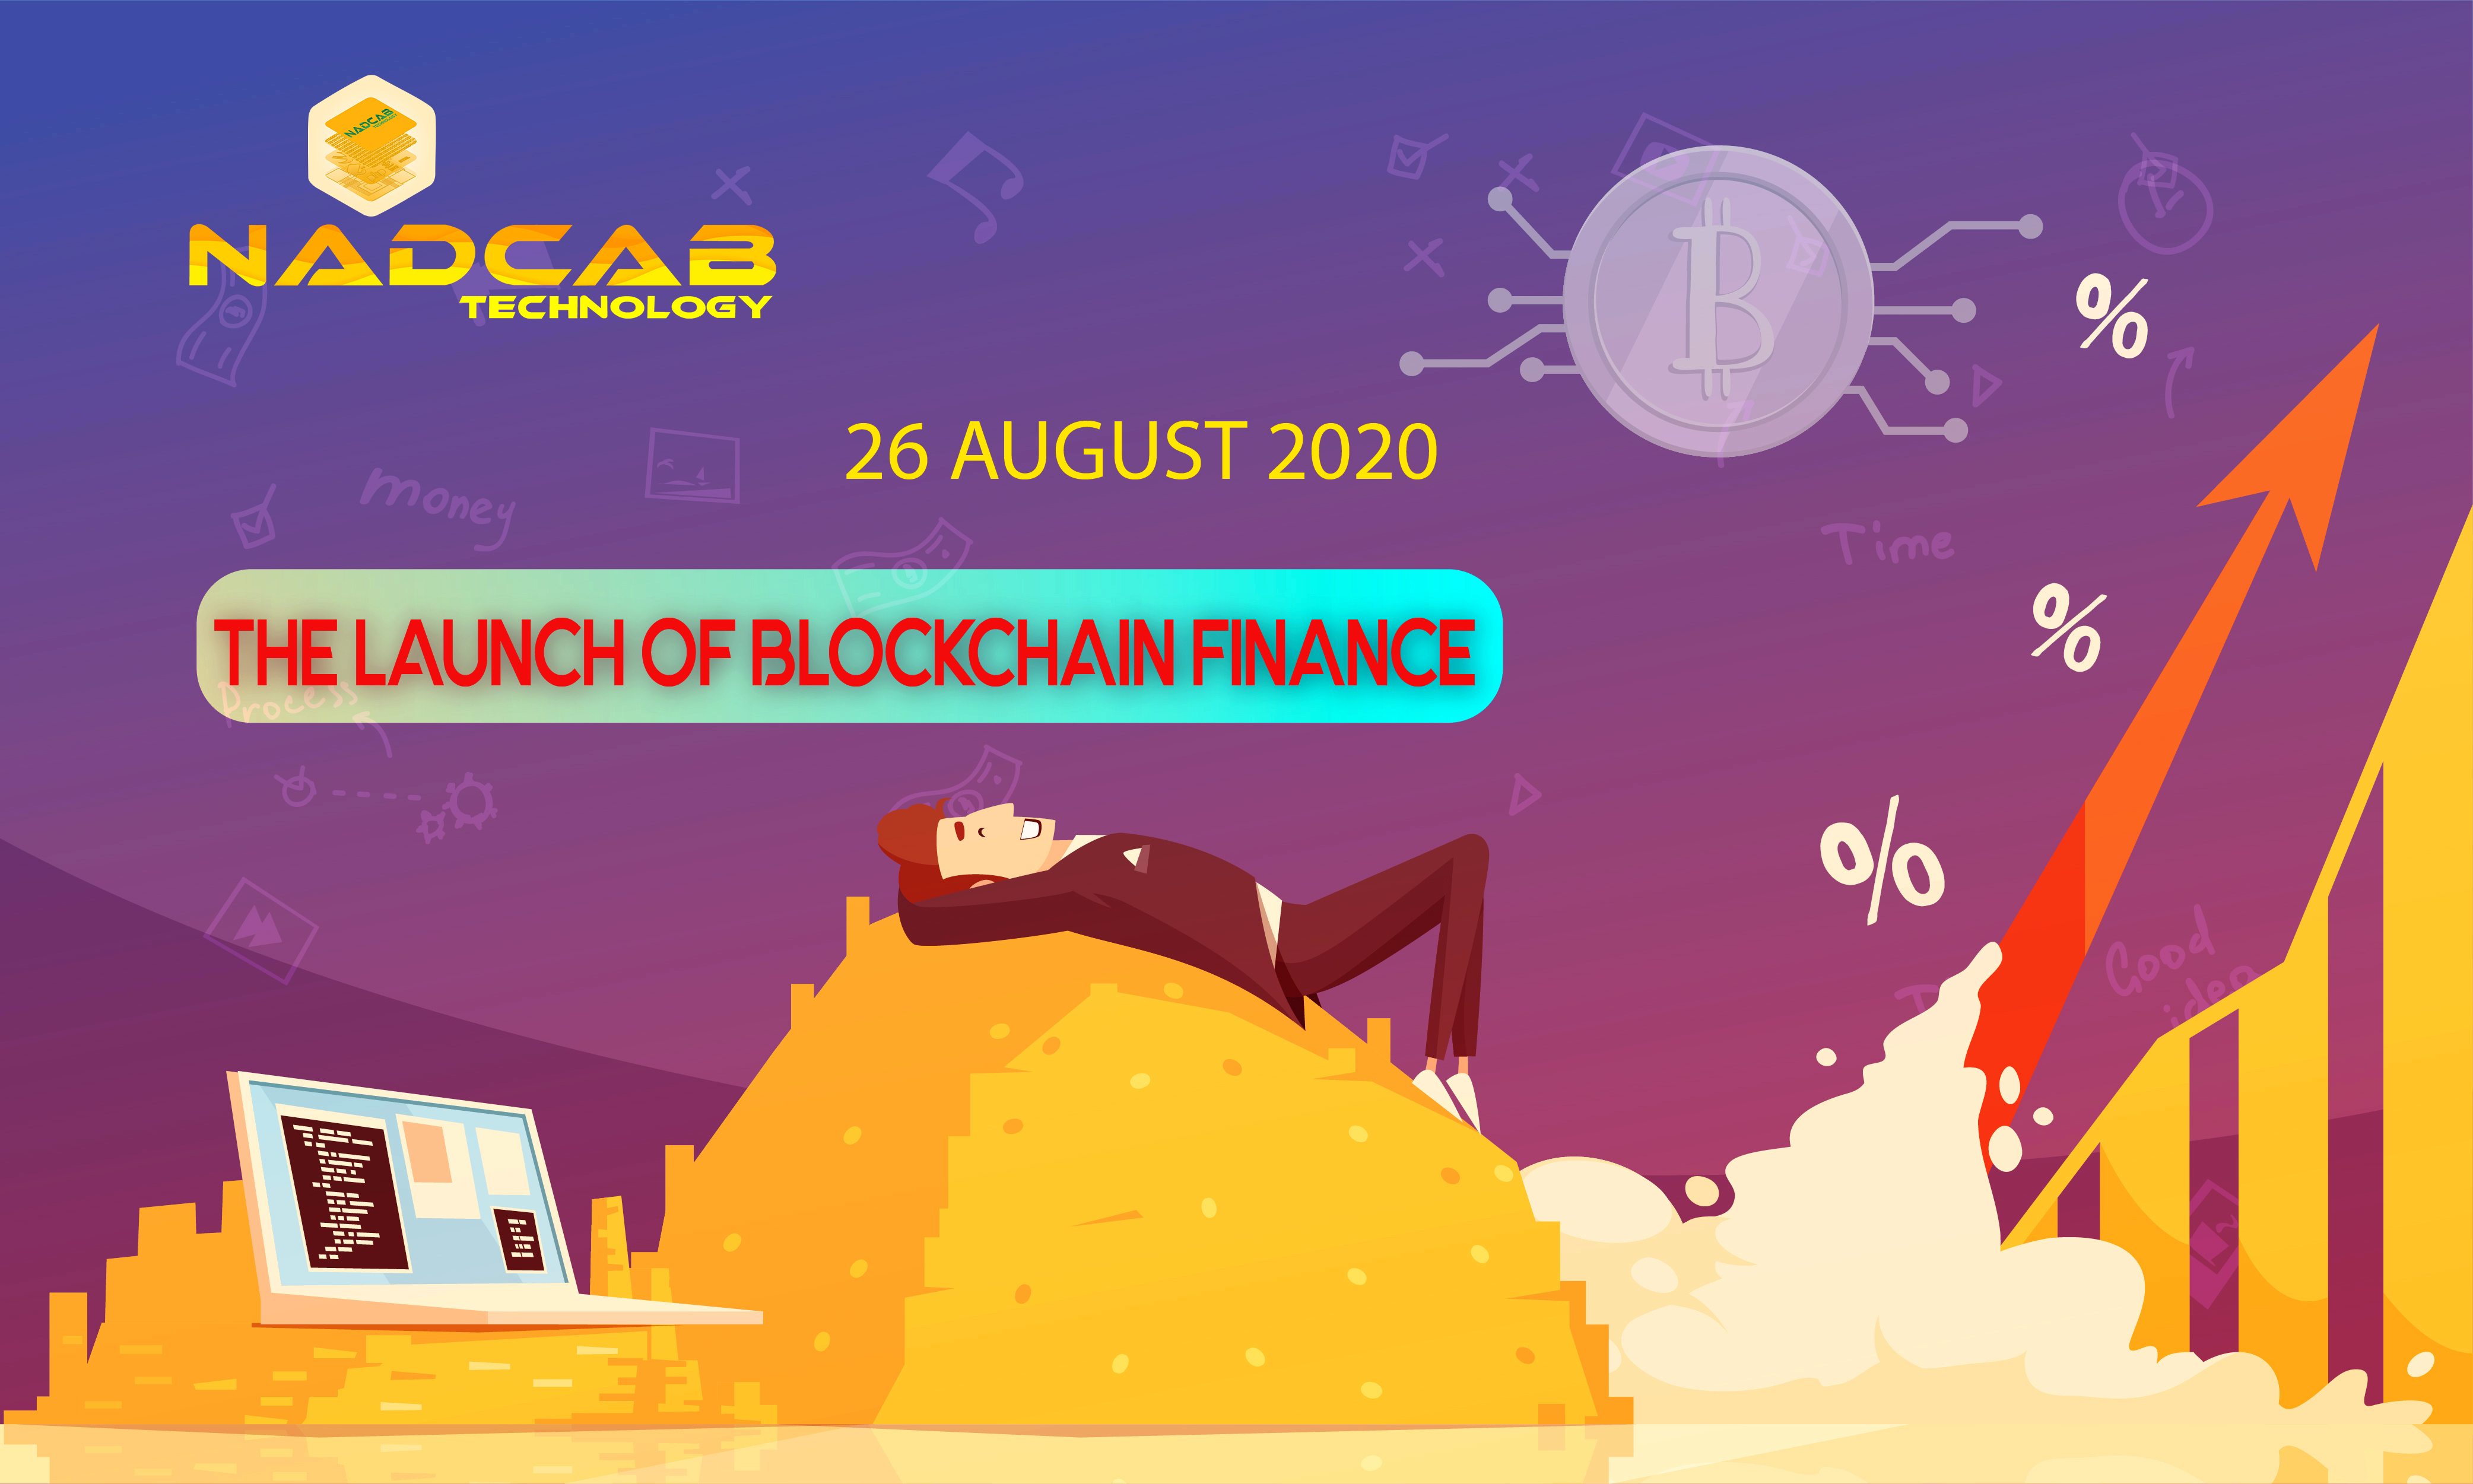 launchofblockchaininfinance2september2020